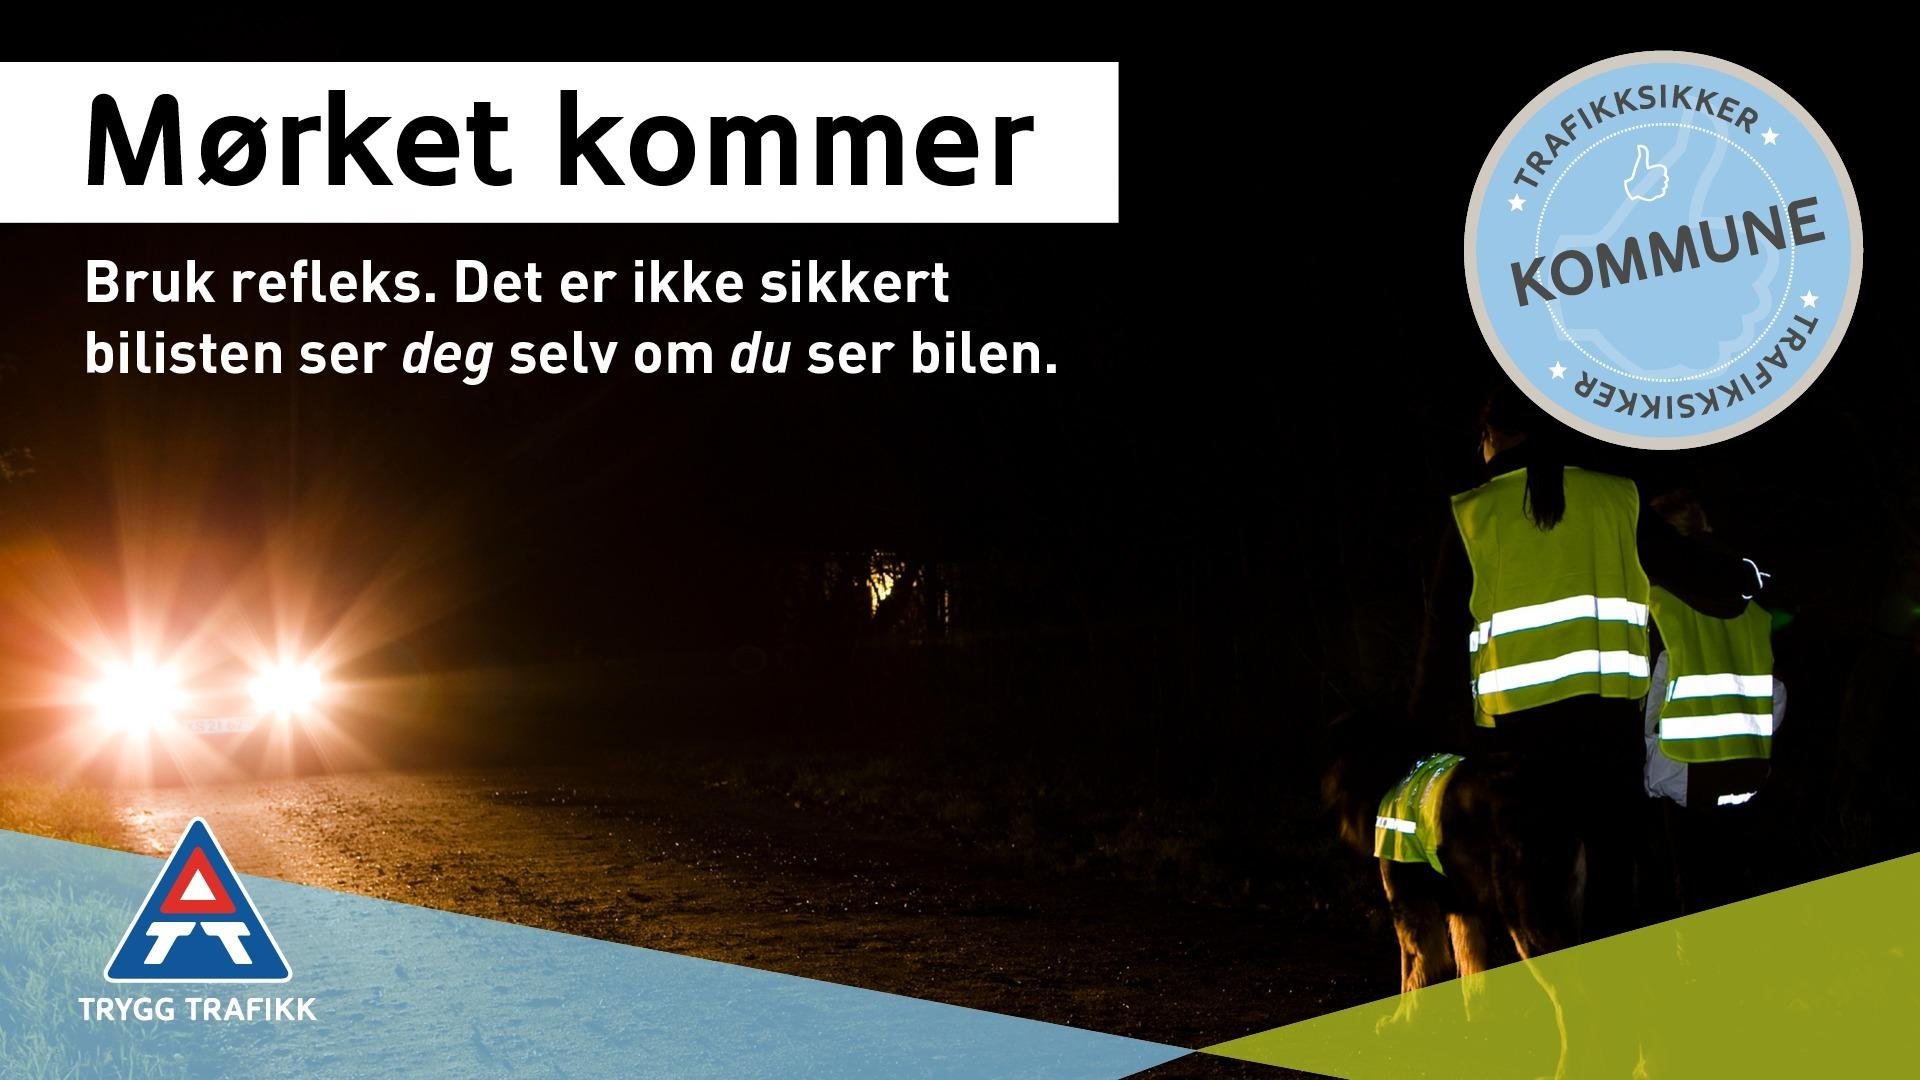 Widescreen_TS_kommune_Oktober_BokmålMørket-kommer-1.jpg